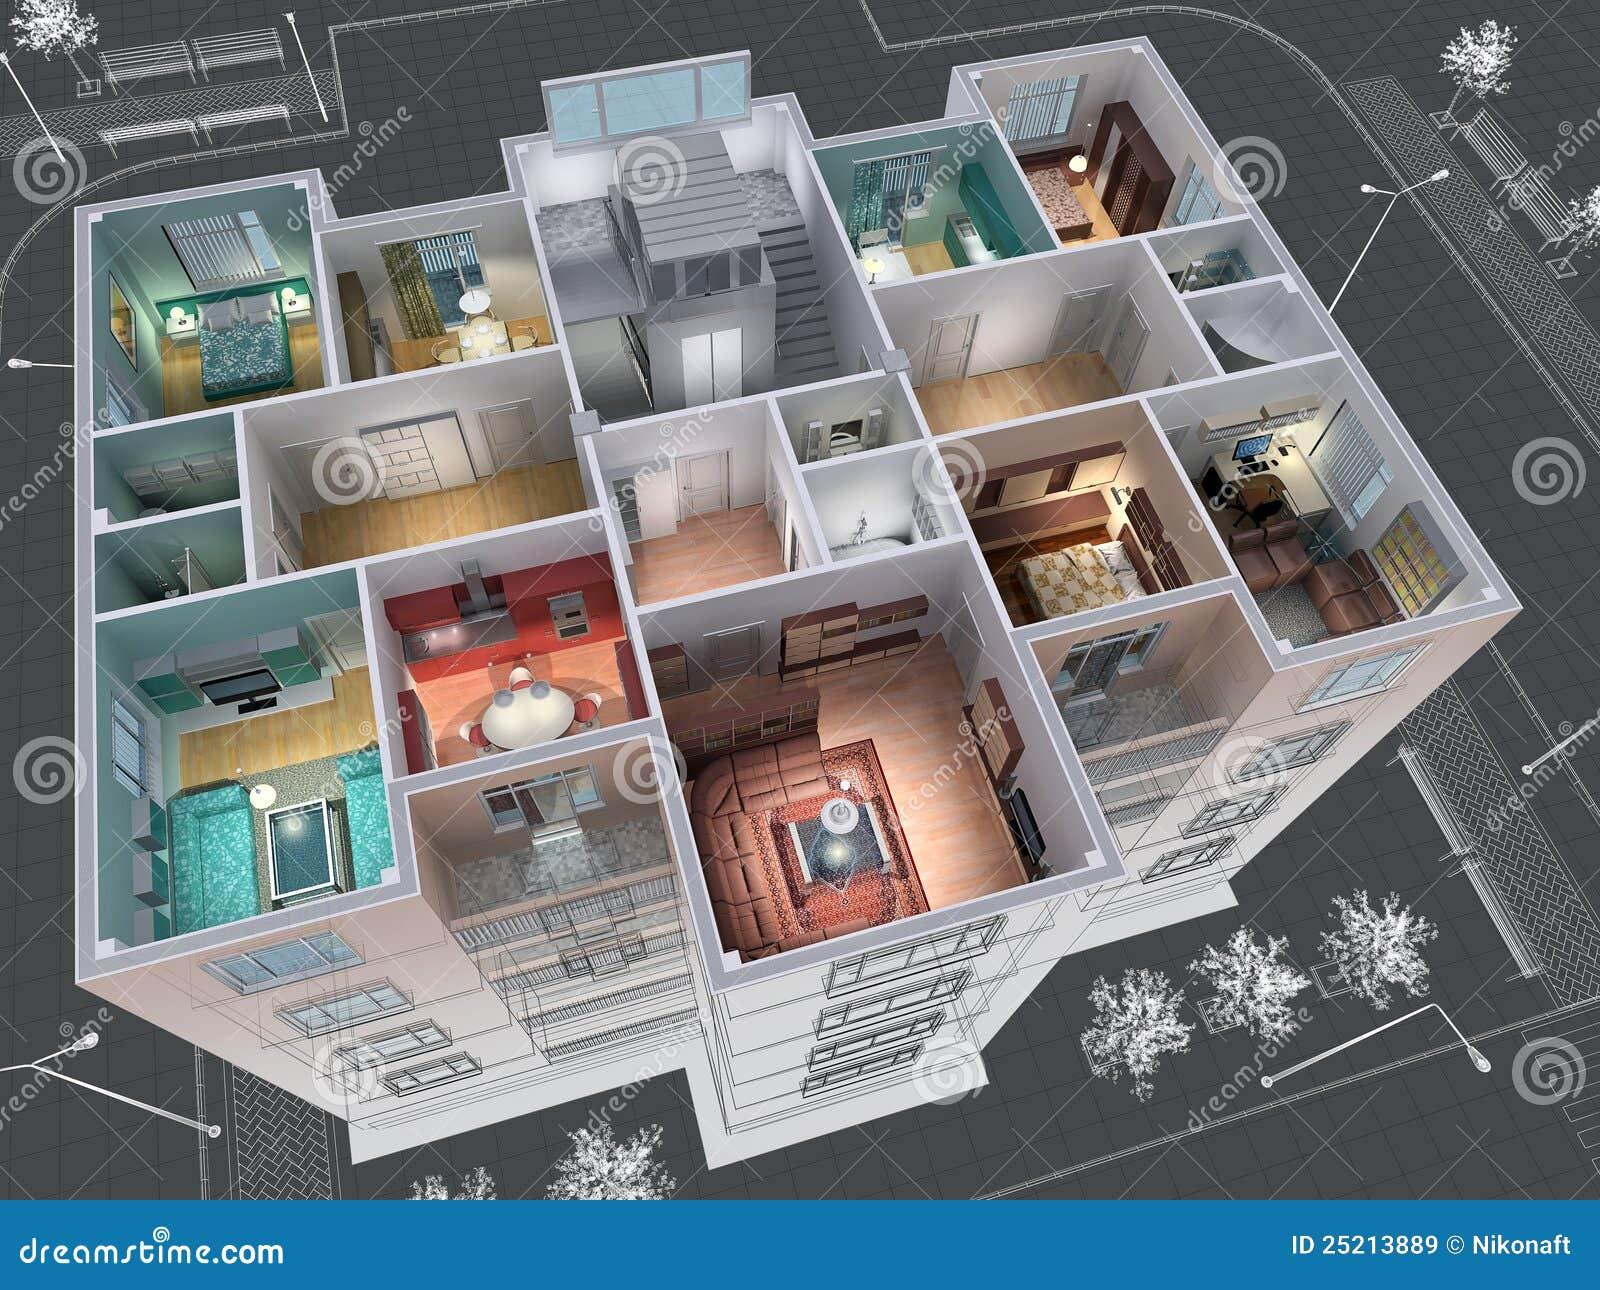 Fußboden Querschnitt ~ Haus stock abbildung illustration von fußboden kreuz